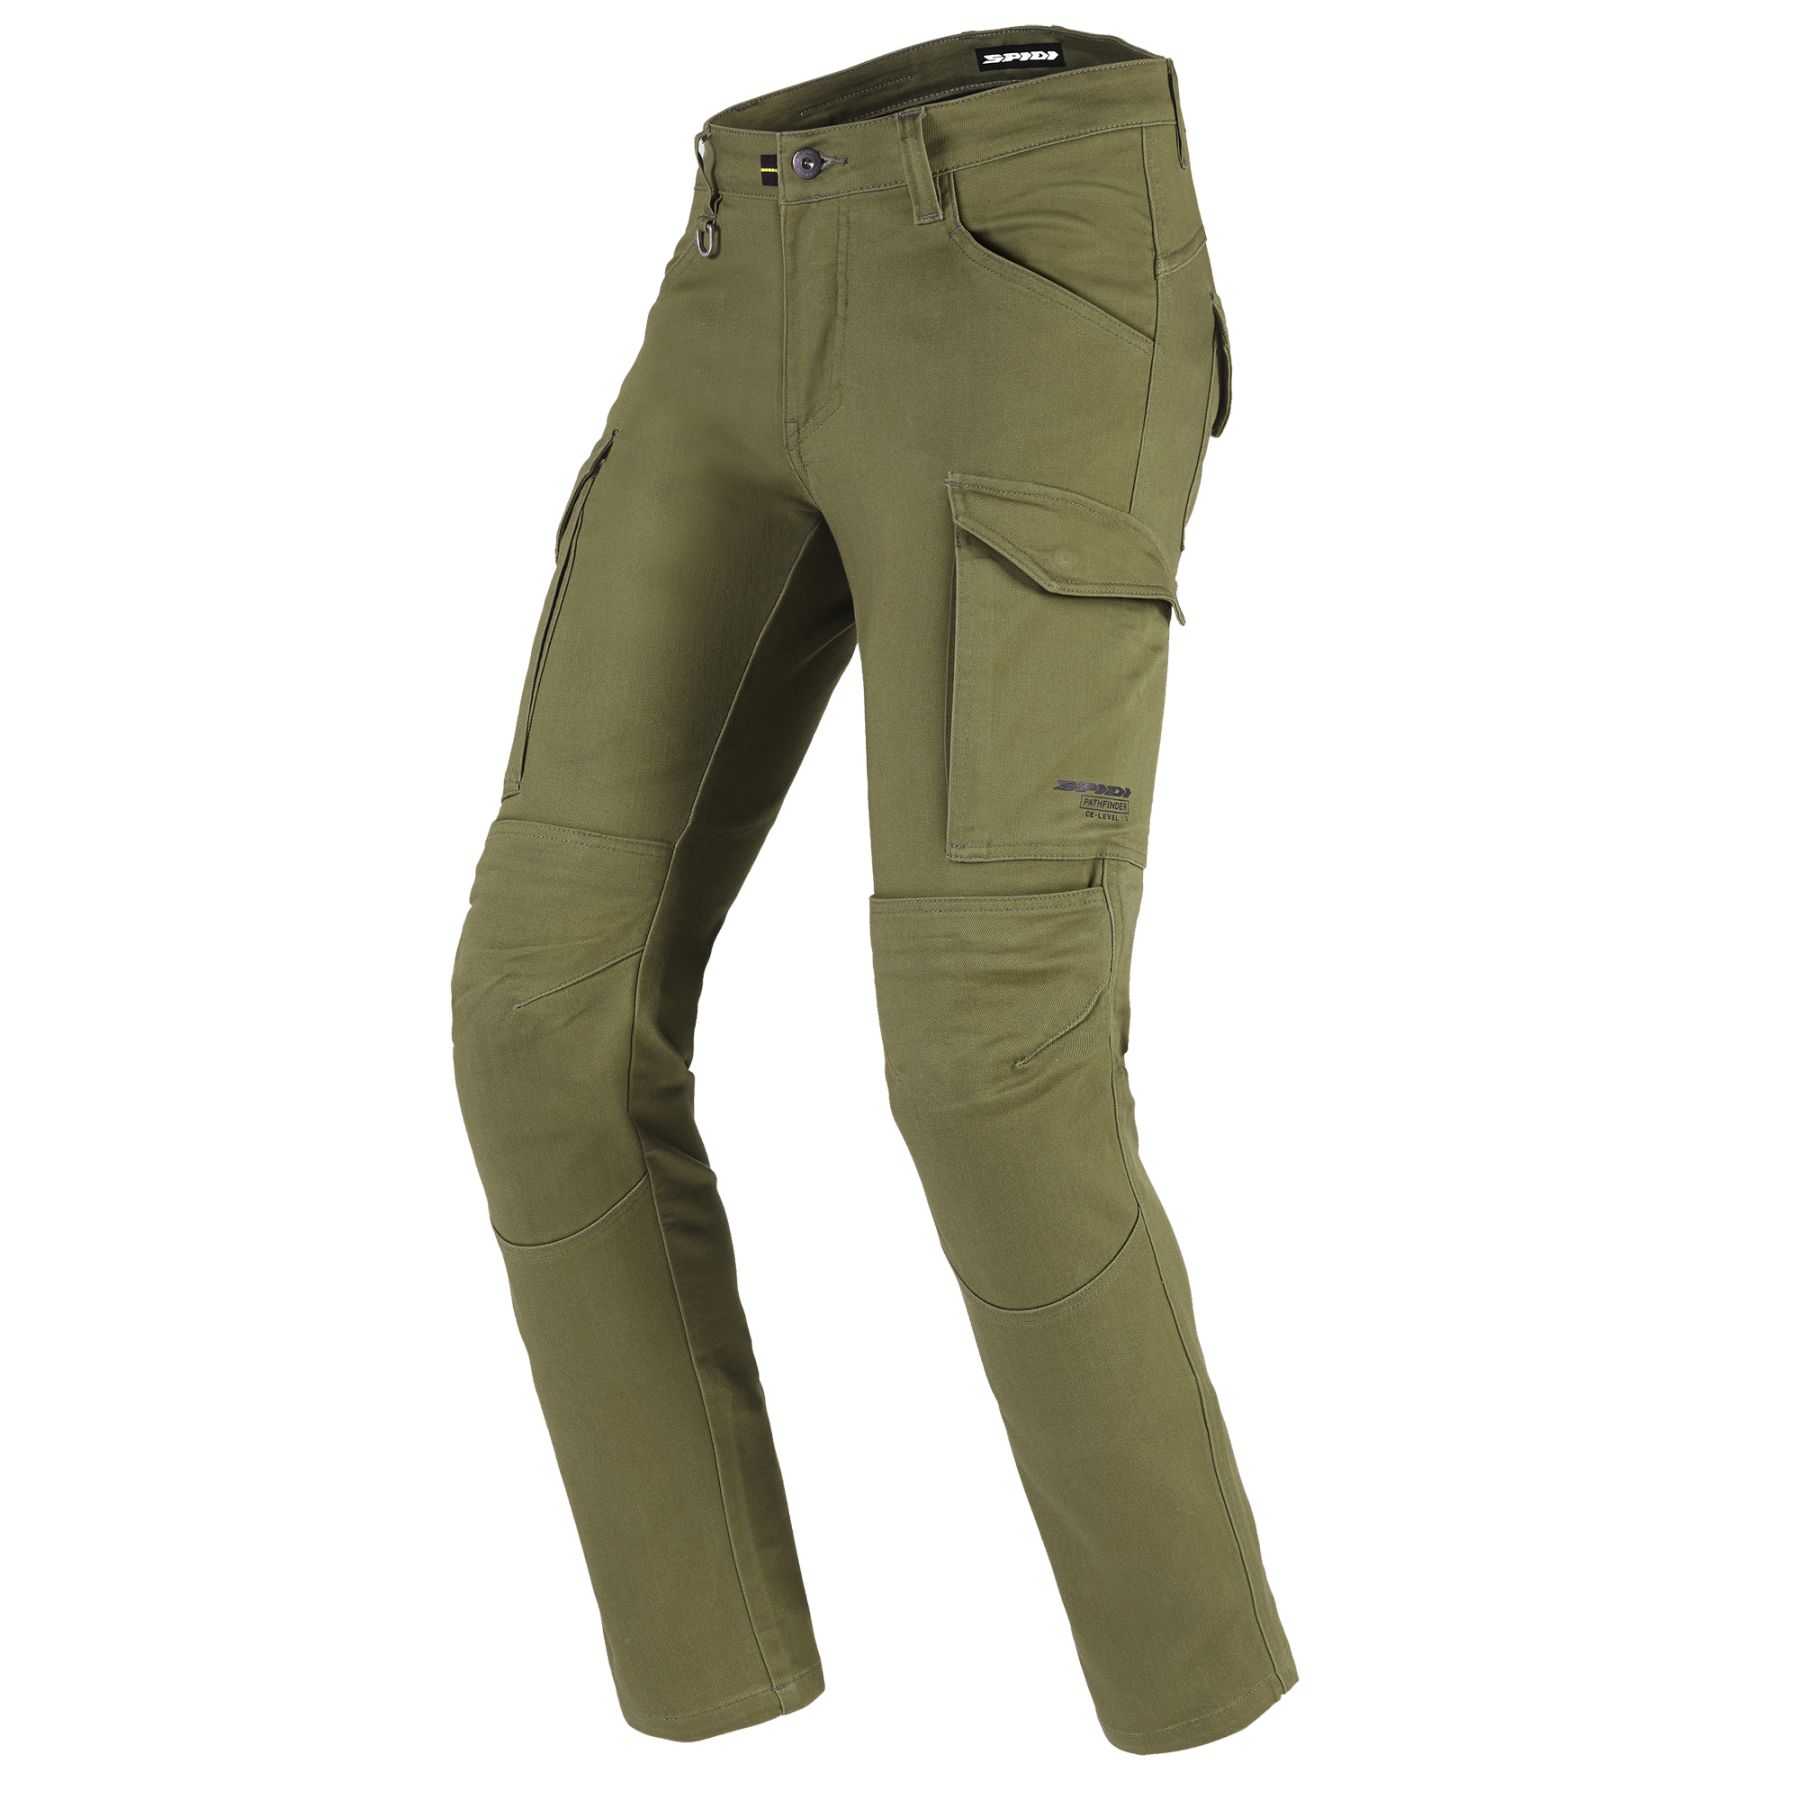 Spidi Pathfinder Cargo Militar Jeans Motorista 34